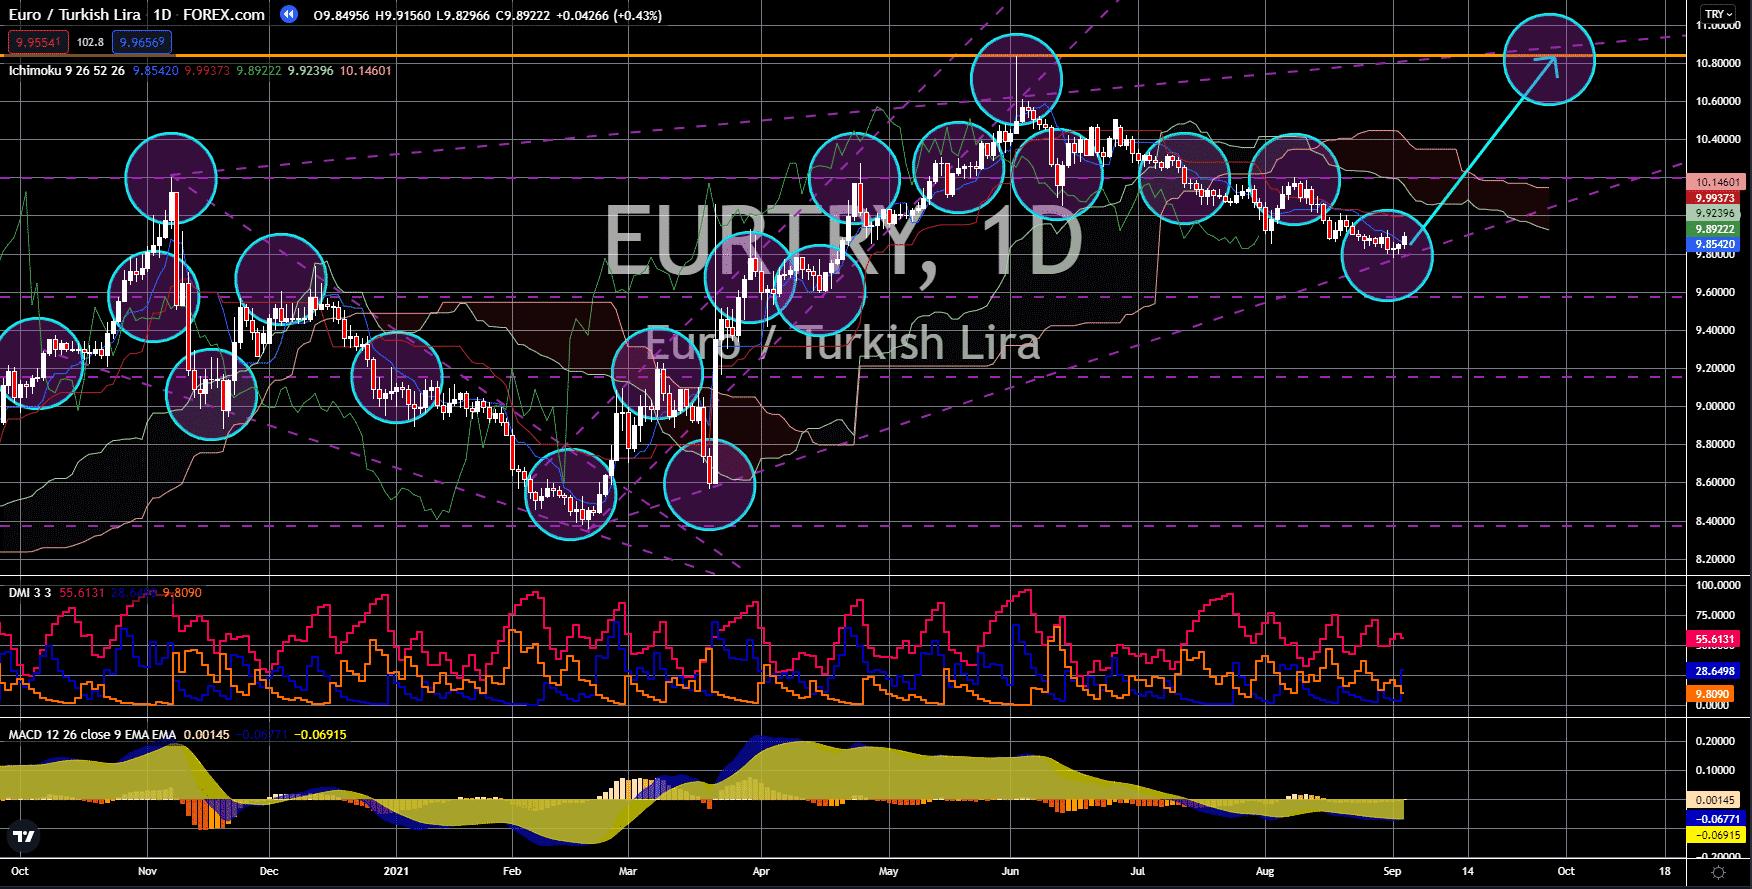 FinanceBrokerage - Market News: EUR/TRY Chart